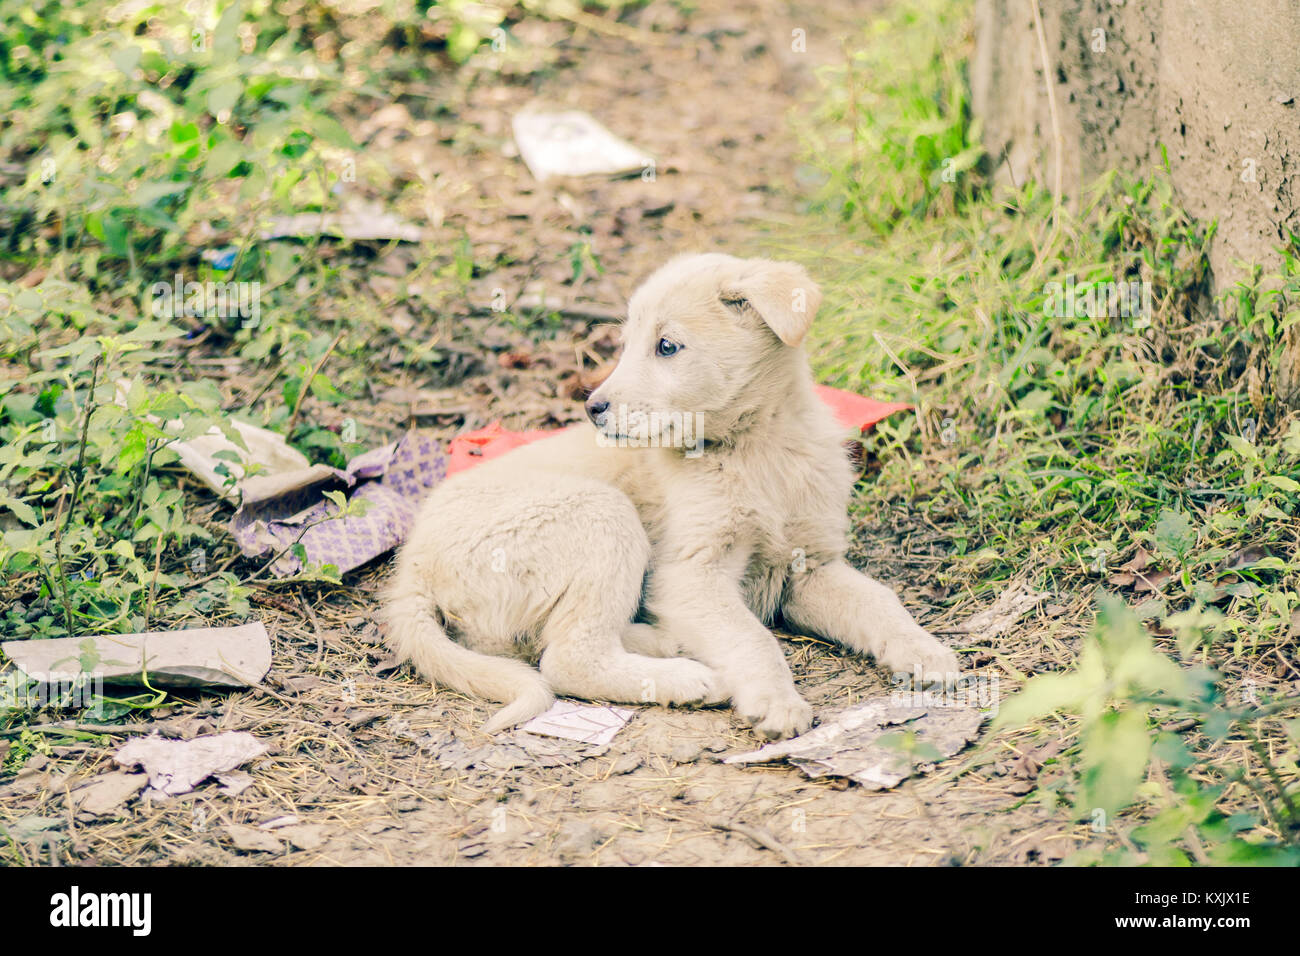 Manali life - Himachal Pradesh - India © Sauriêl Ltd   Samantha Scholl   fb.com/SaurielPhotography   www.saurielcreative.com - Stock Image